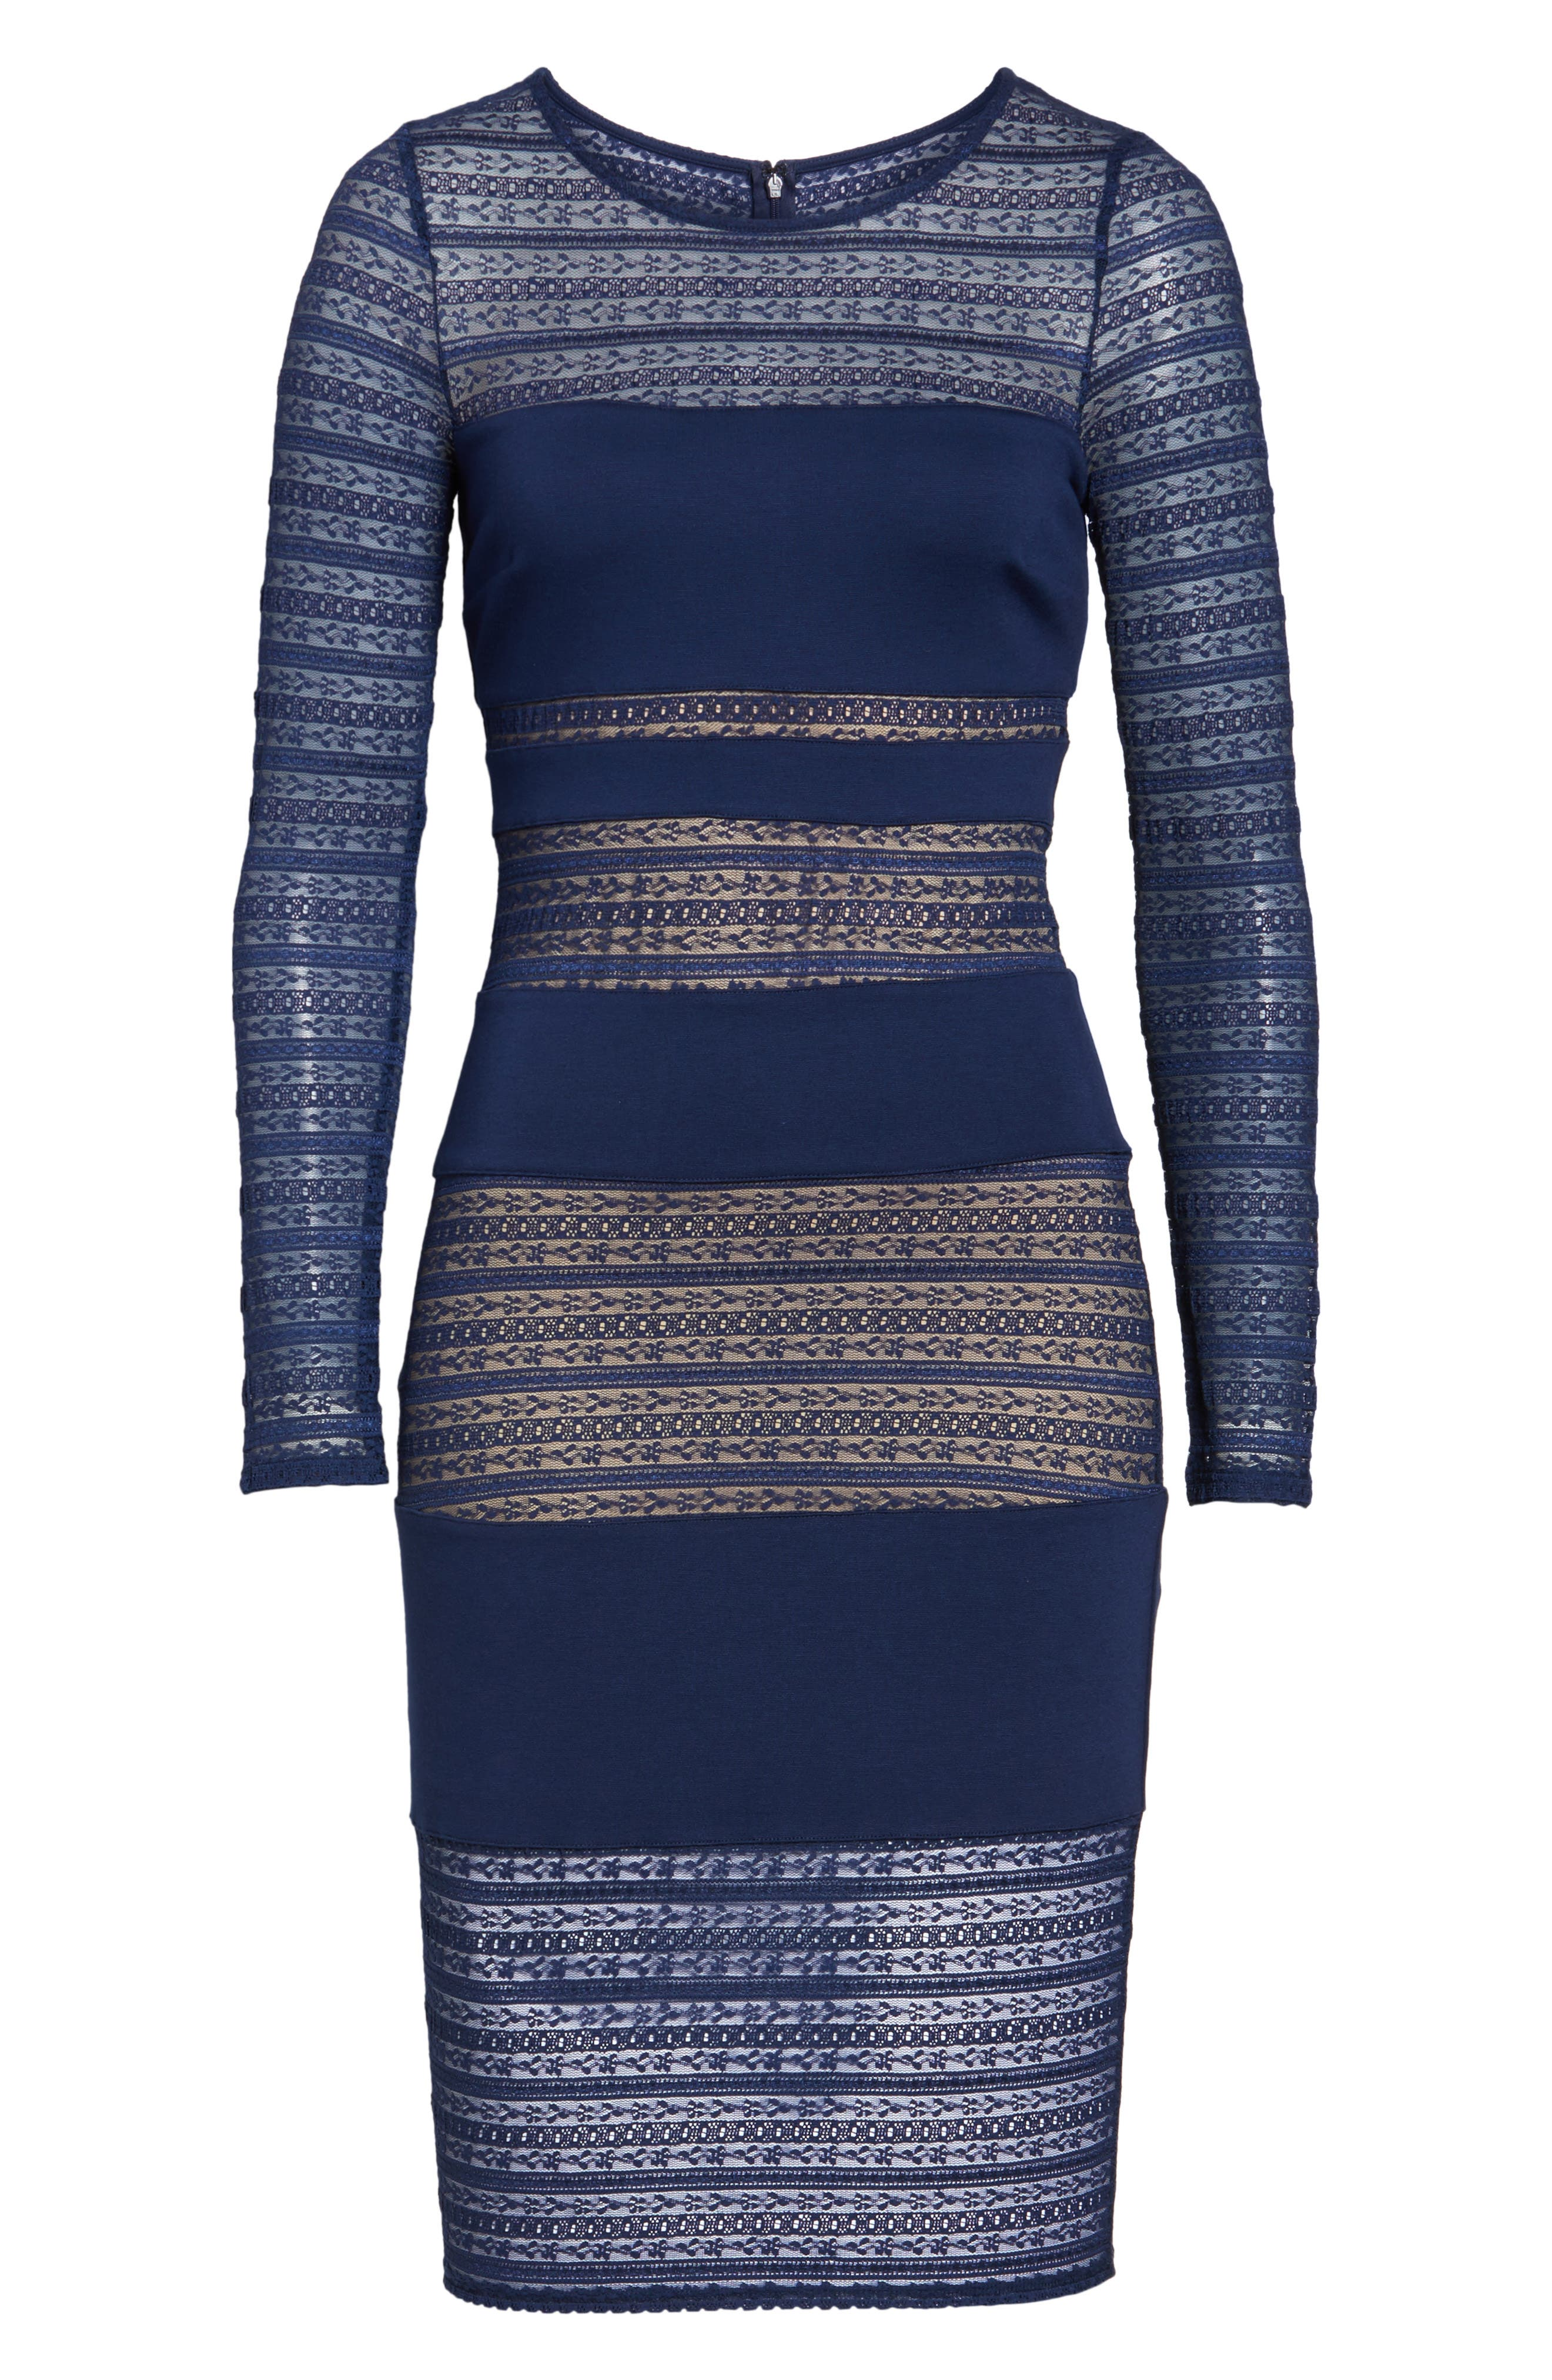 Lovestruck Stripe Body-Con Dress,                             Alternate thumbnail 7, color,                             Navy